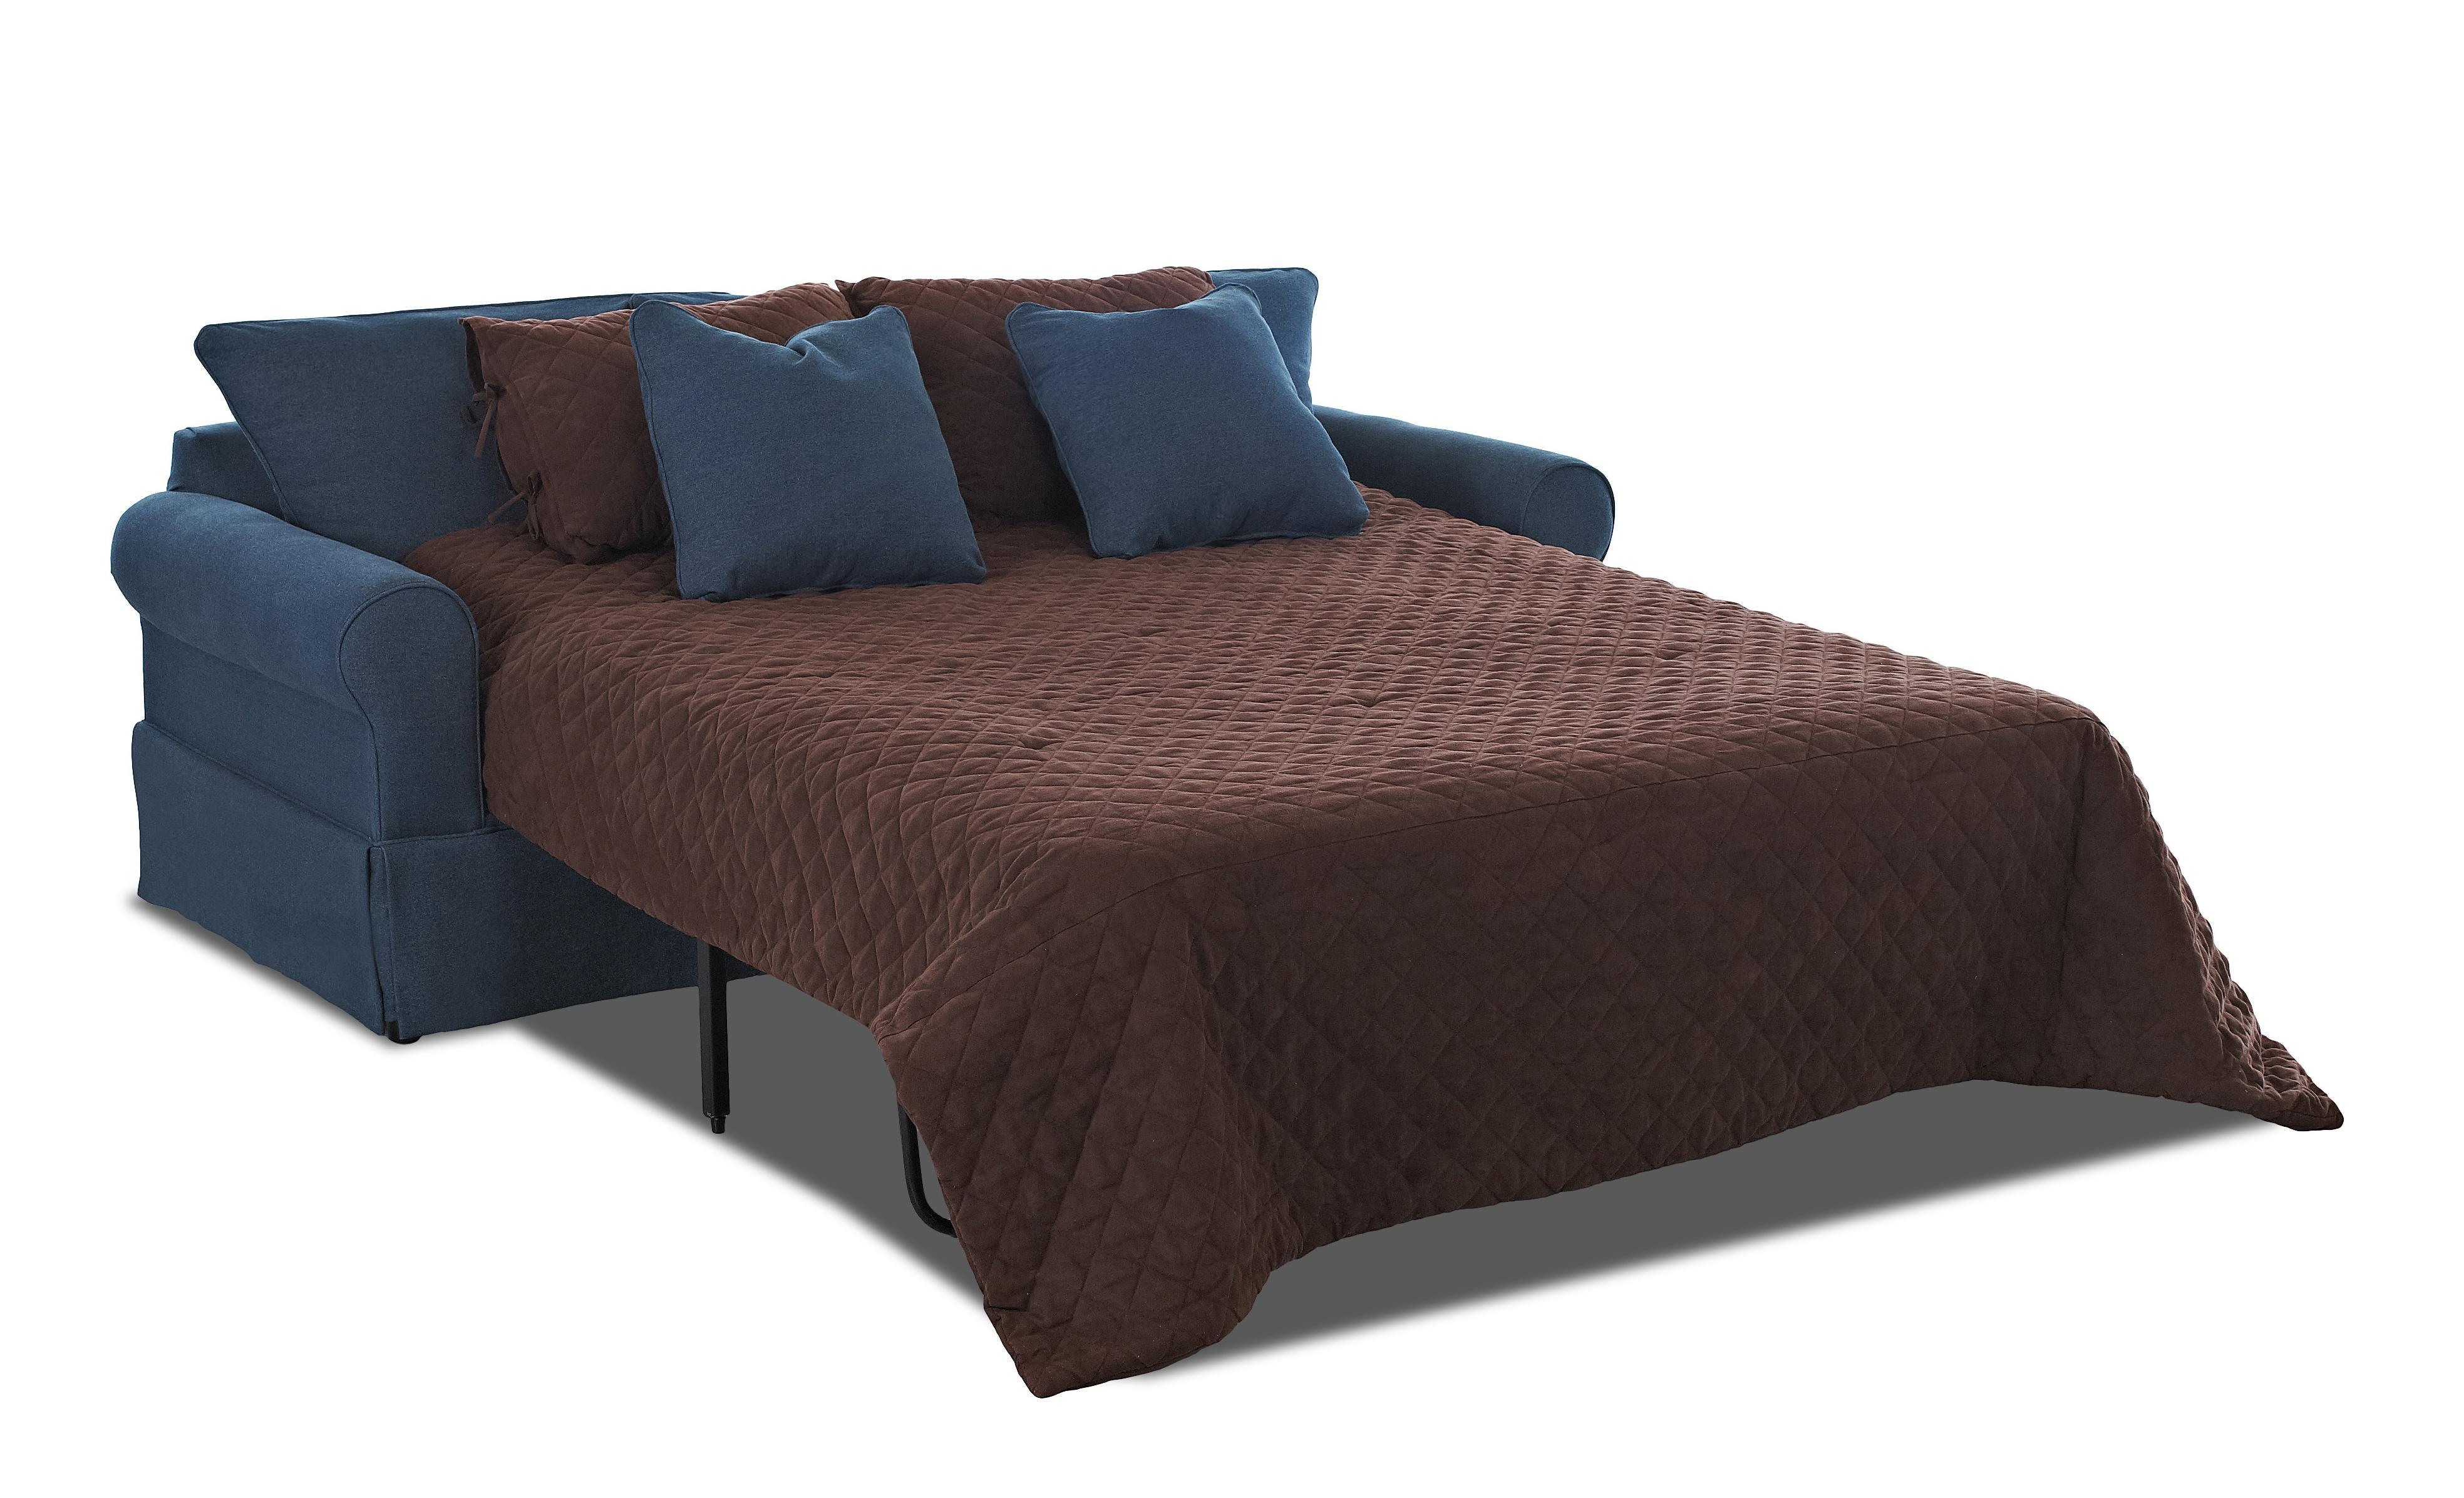 Klaussner Brook Dreamquest Queen Sleeper Sofa  - Item Number: 8200DQSL